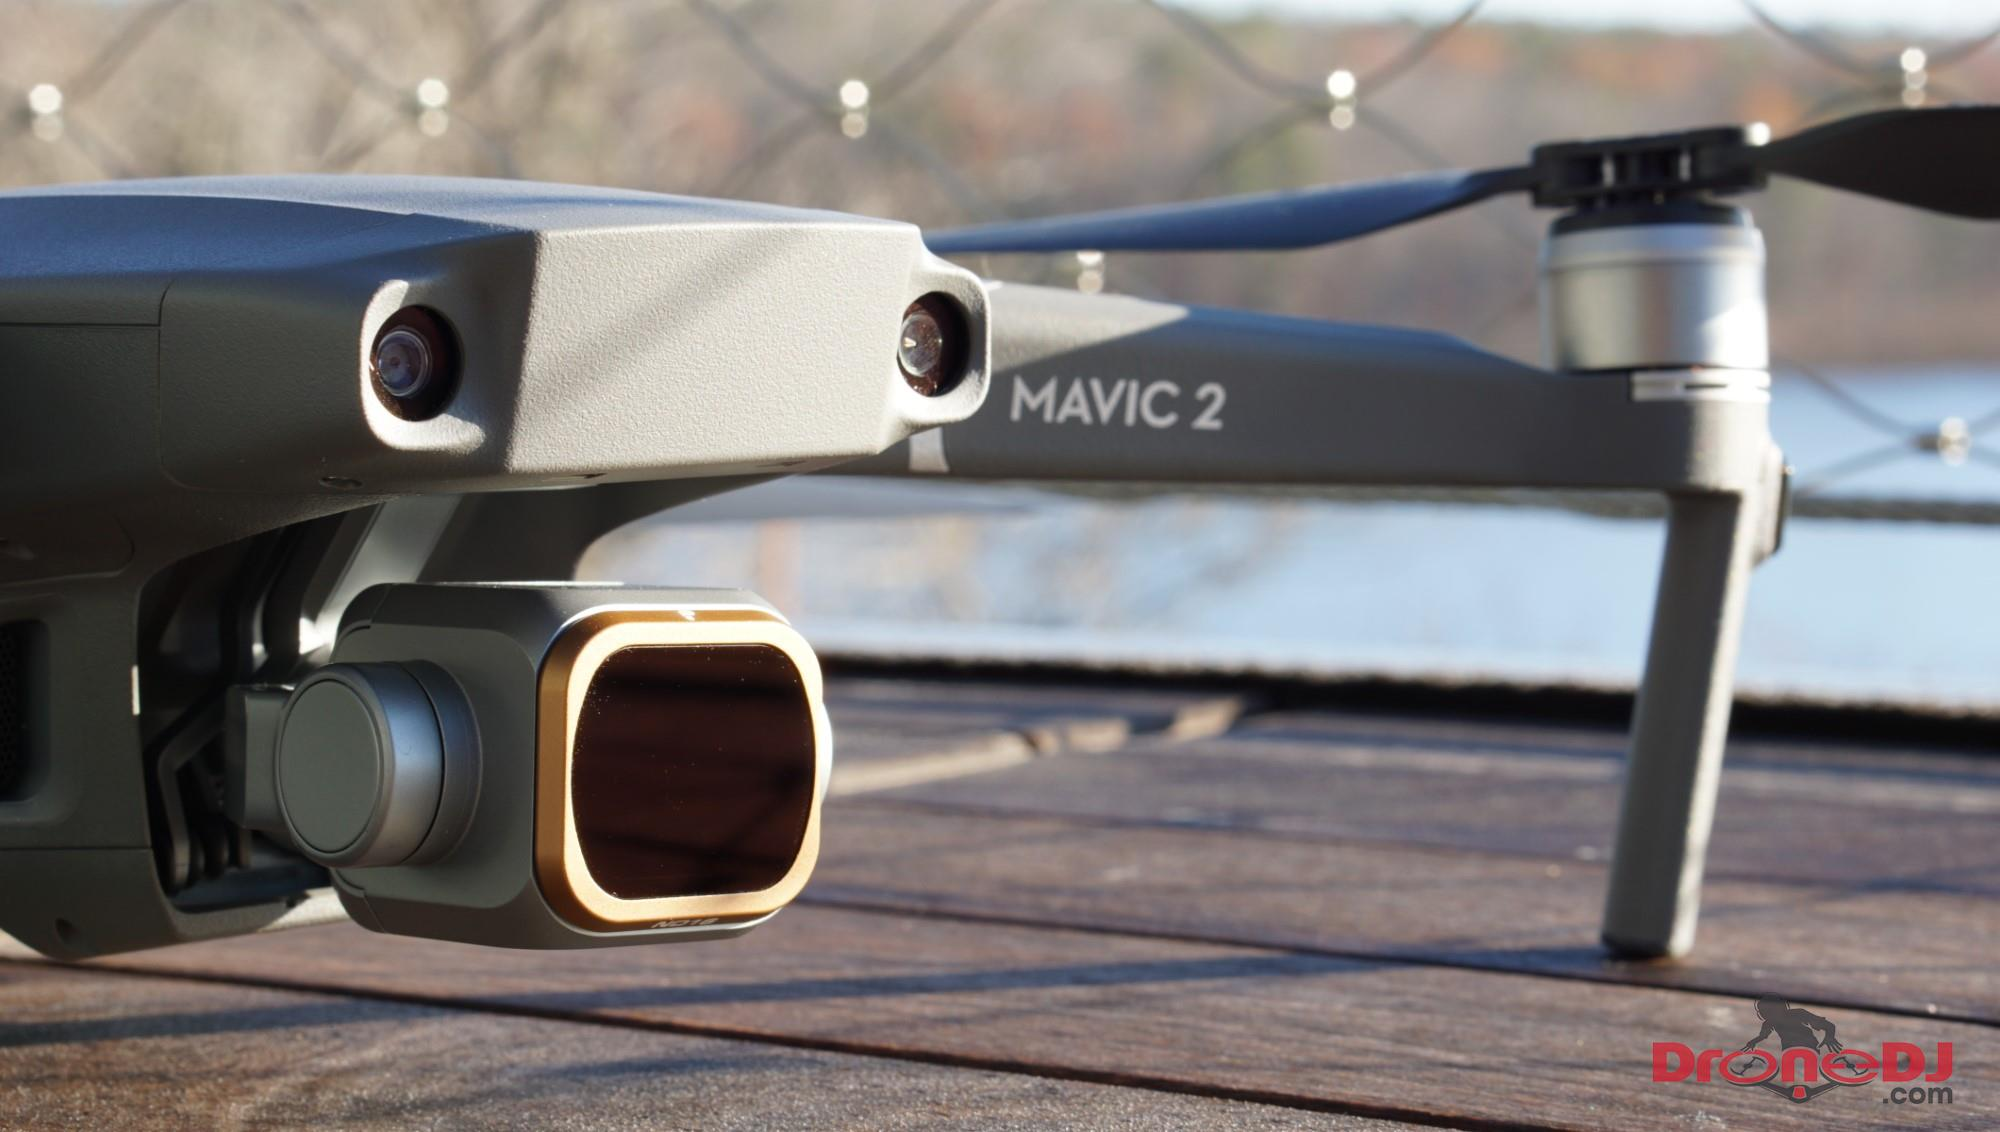 Mavic 2 Pro with polar pro filter.JPG